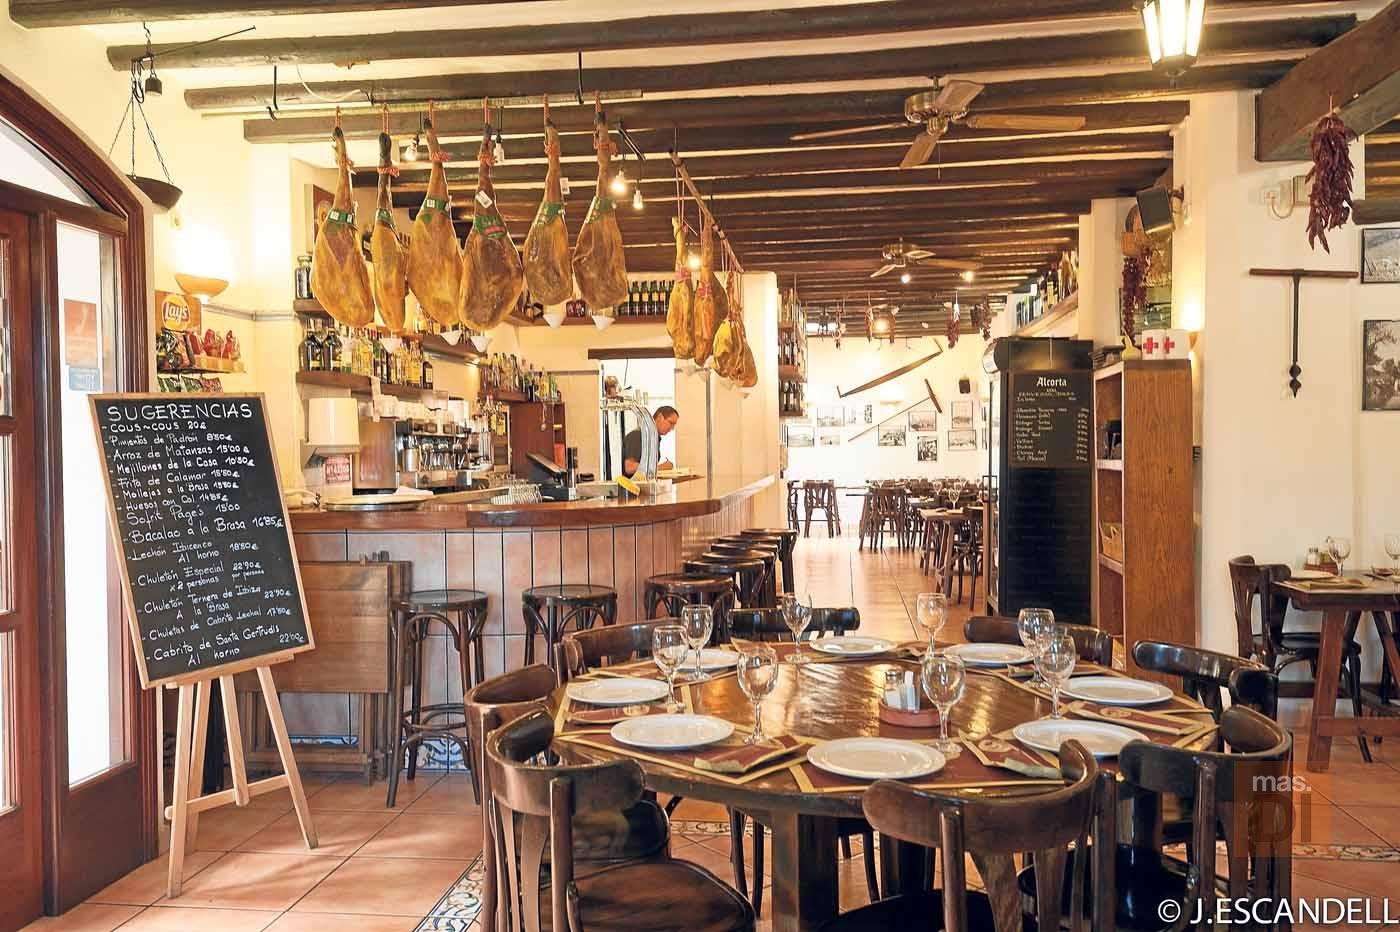 Companatge – Can Caus. De la granja a la mesa en un mismo lugar